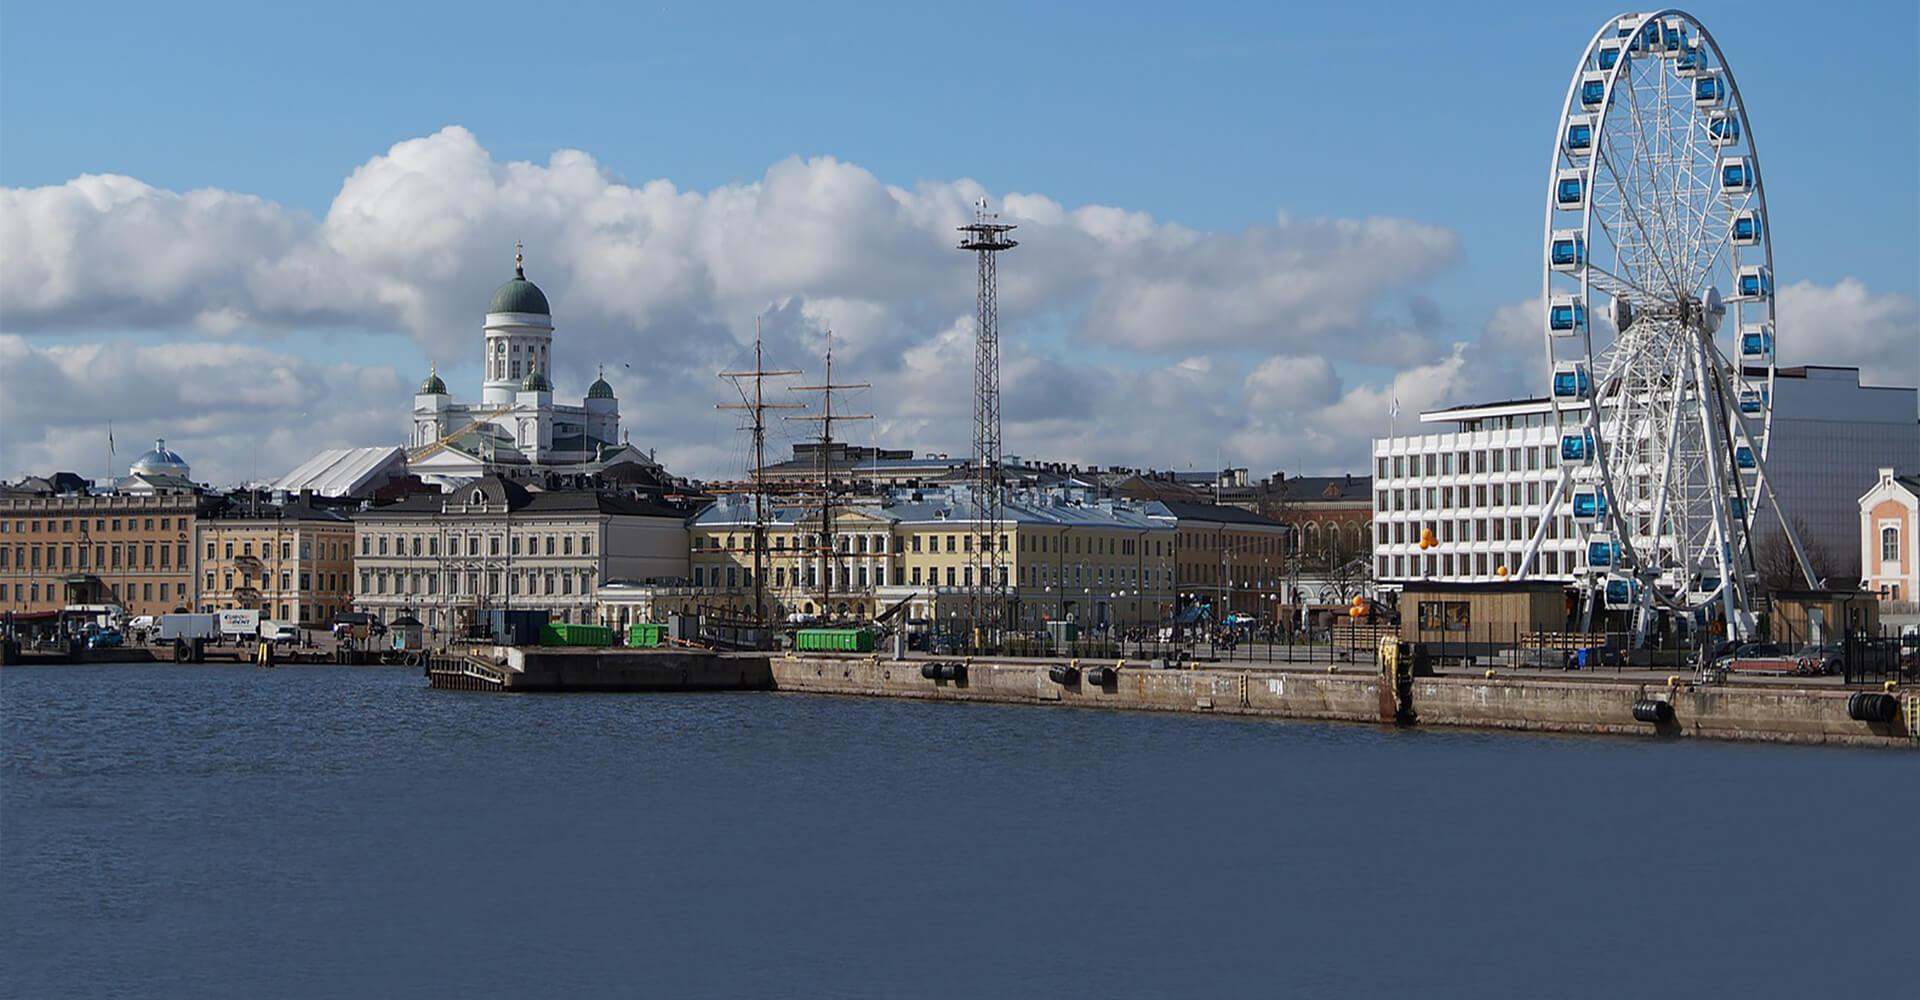 Fairytale Helsinki